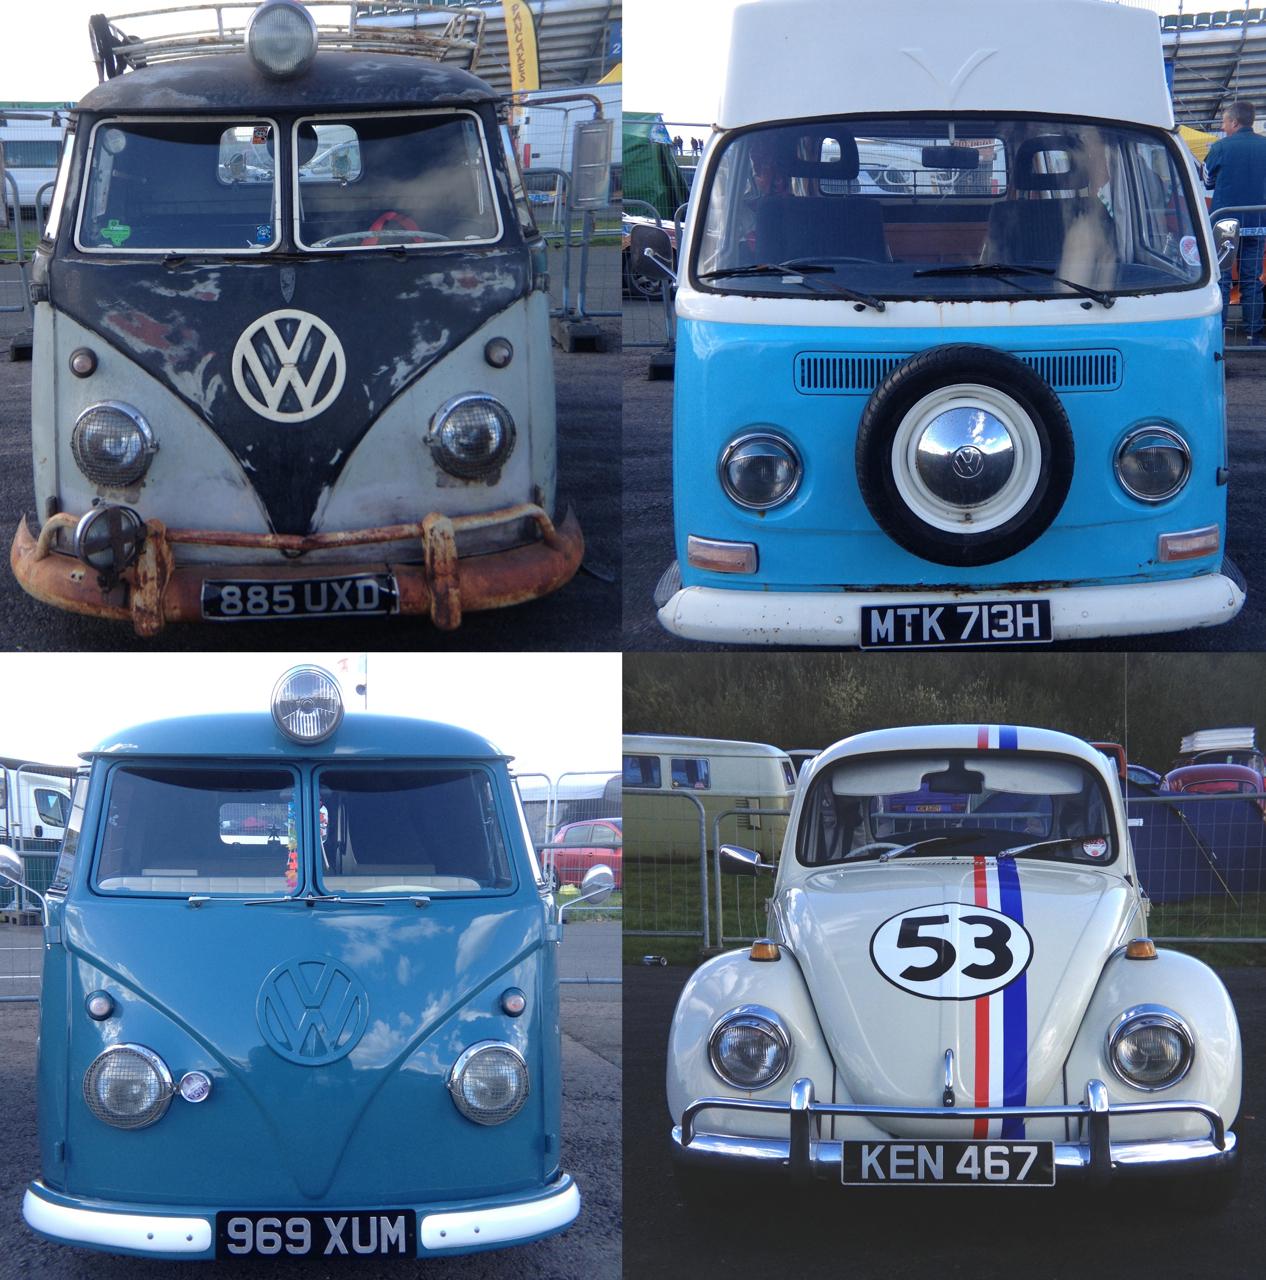 VW montage